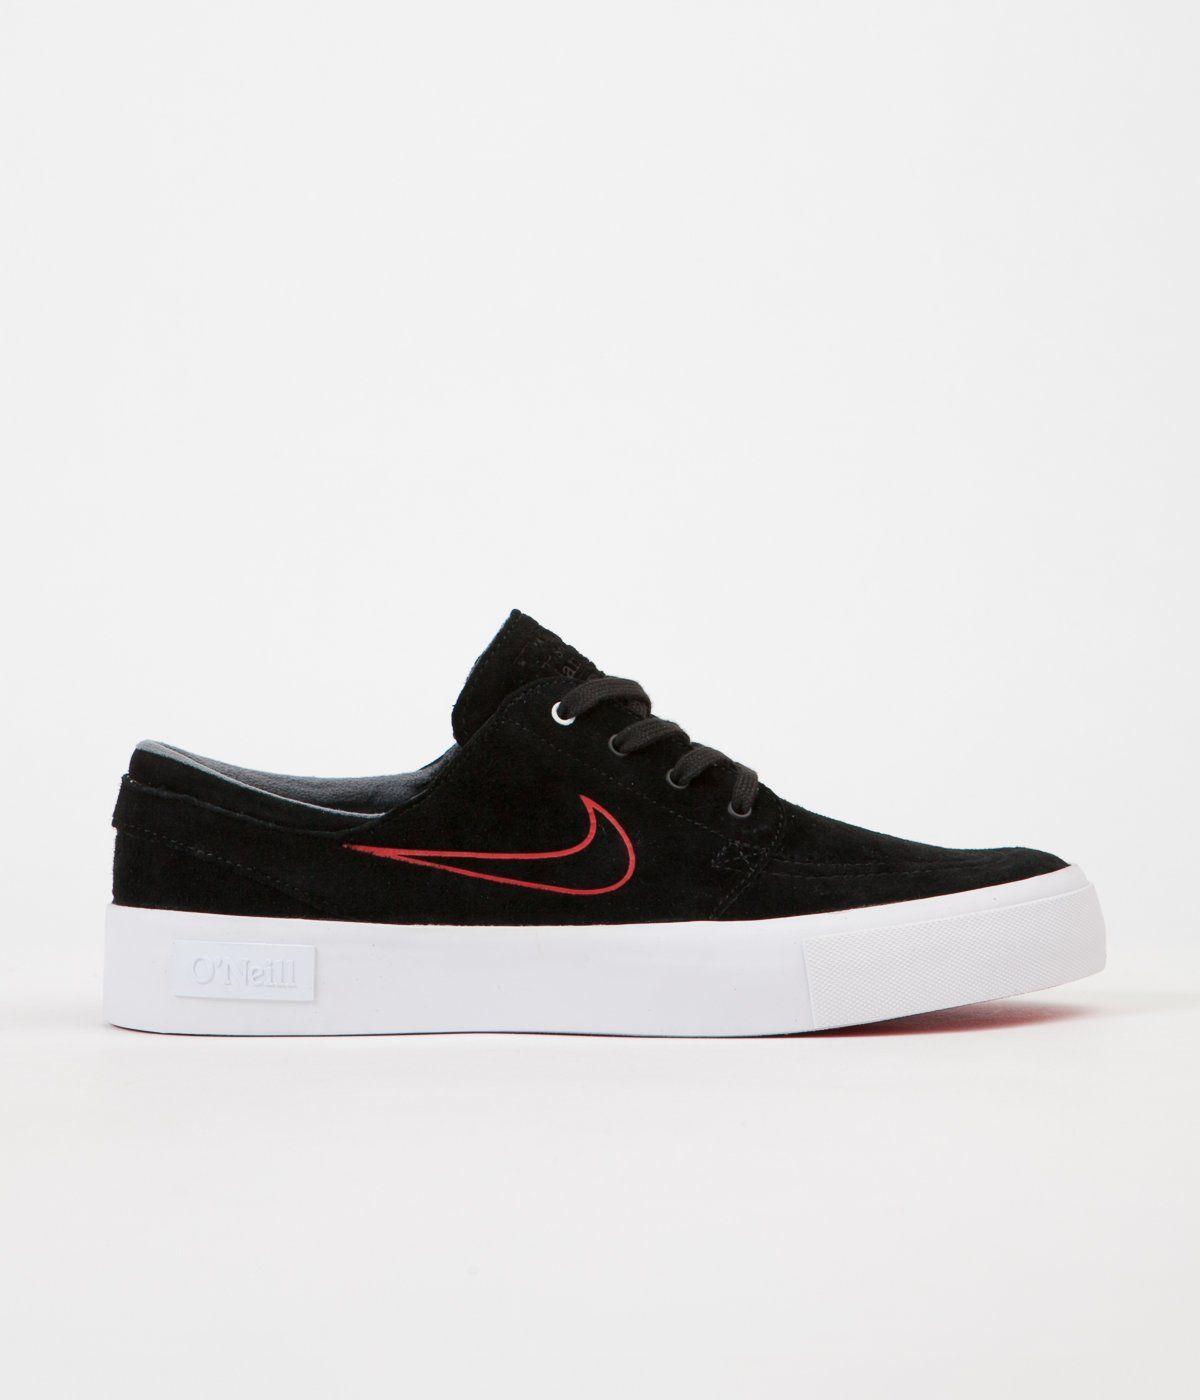 Nike SB Stefan Janoski HT Shane O Neill Shoes - Black   University Red -  White 5a98b2e8501